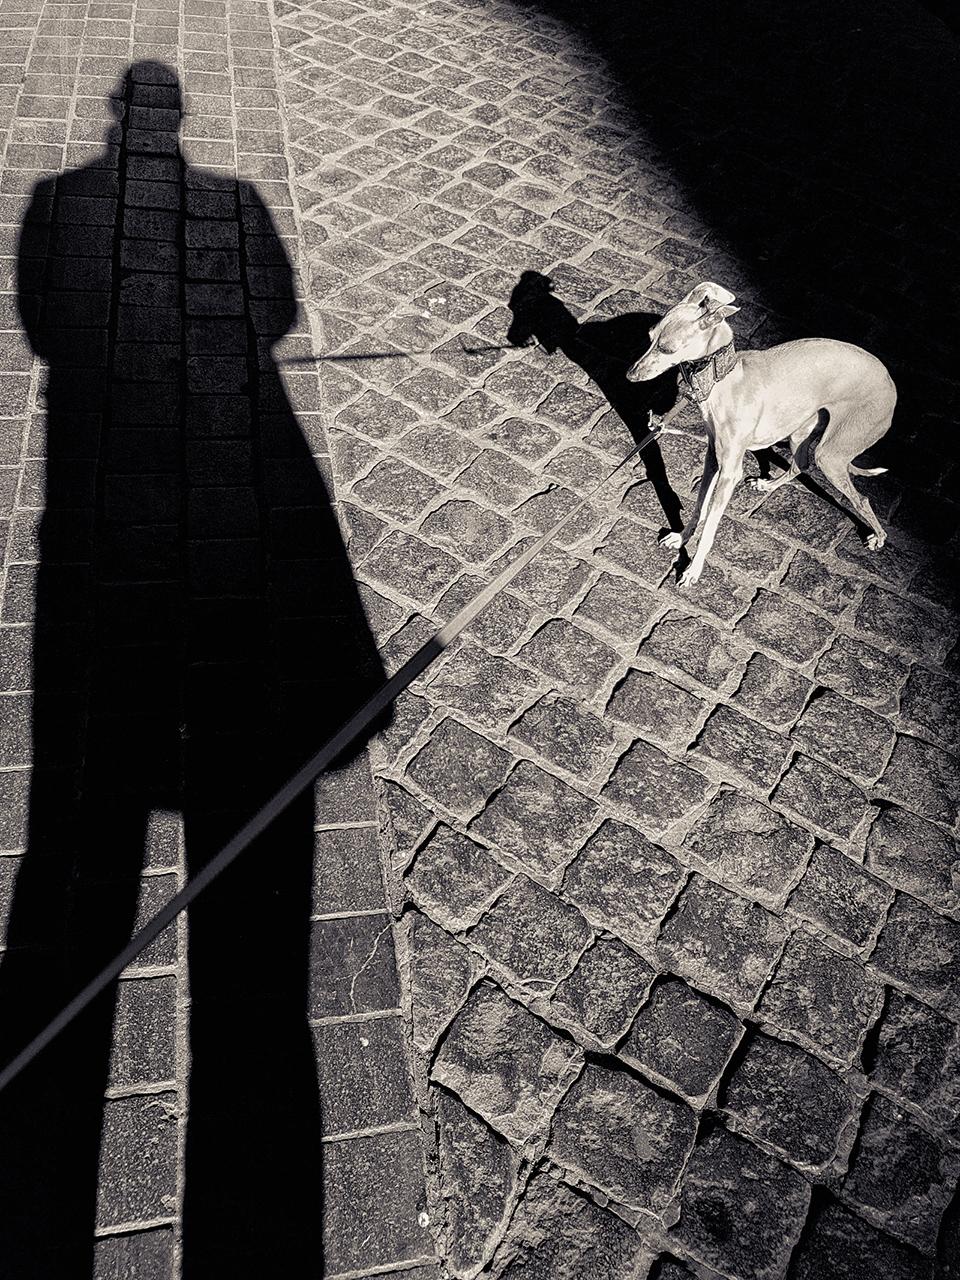 PixelShadow1